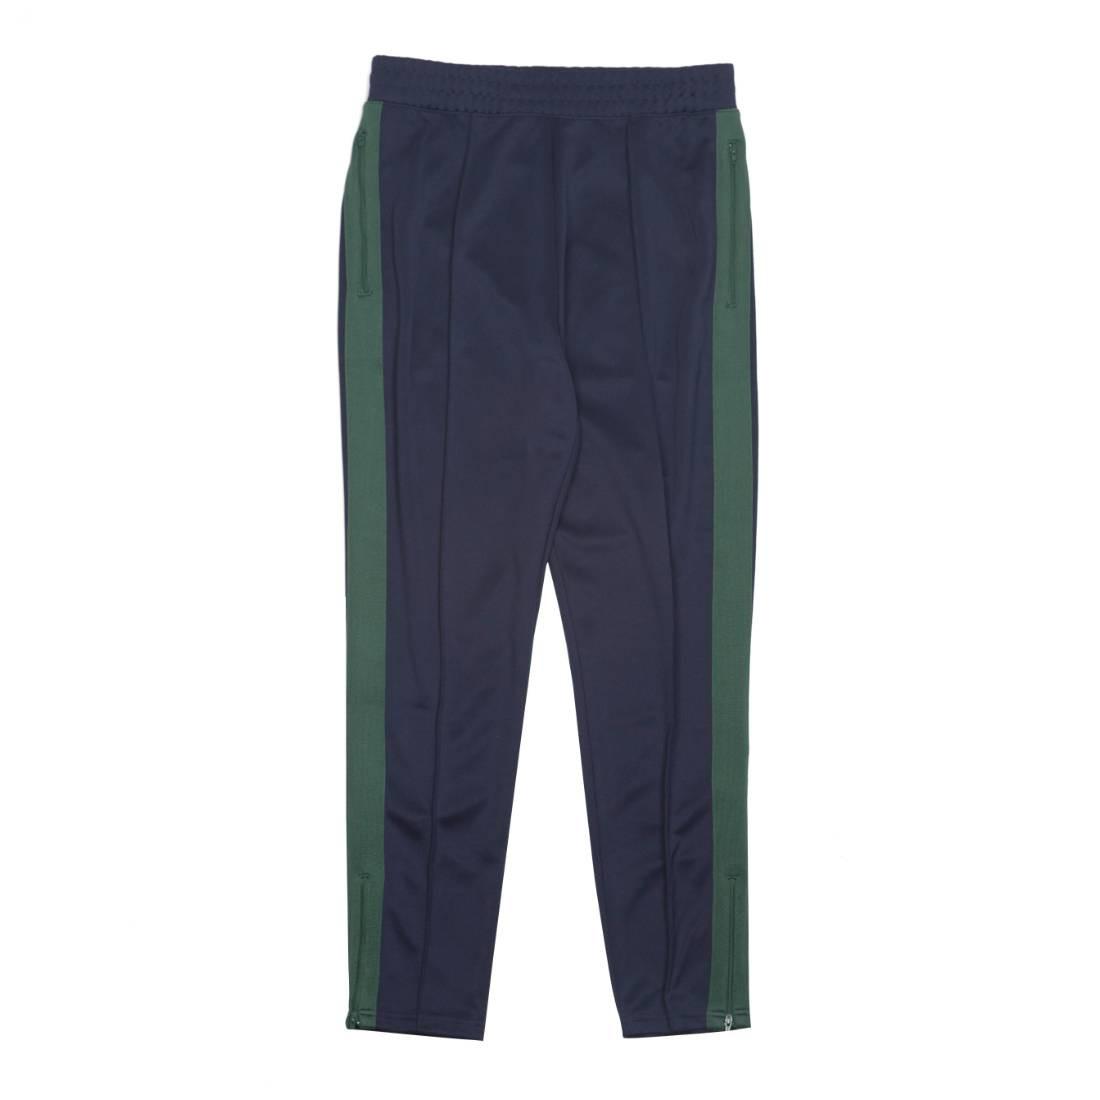 Nike Men M Nrg K Track Pant (blackened blue / fir)